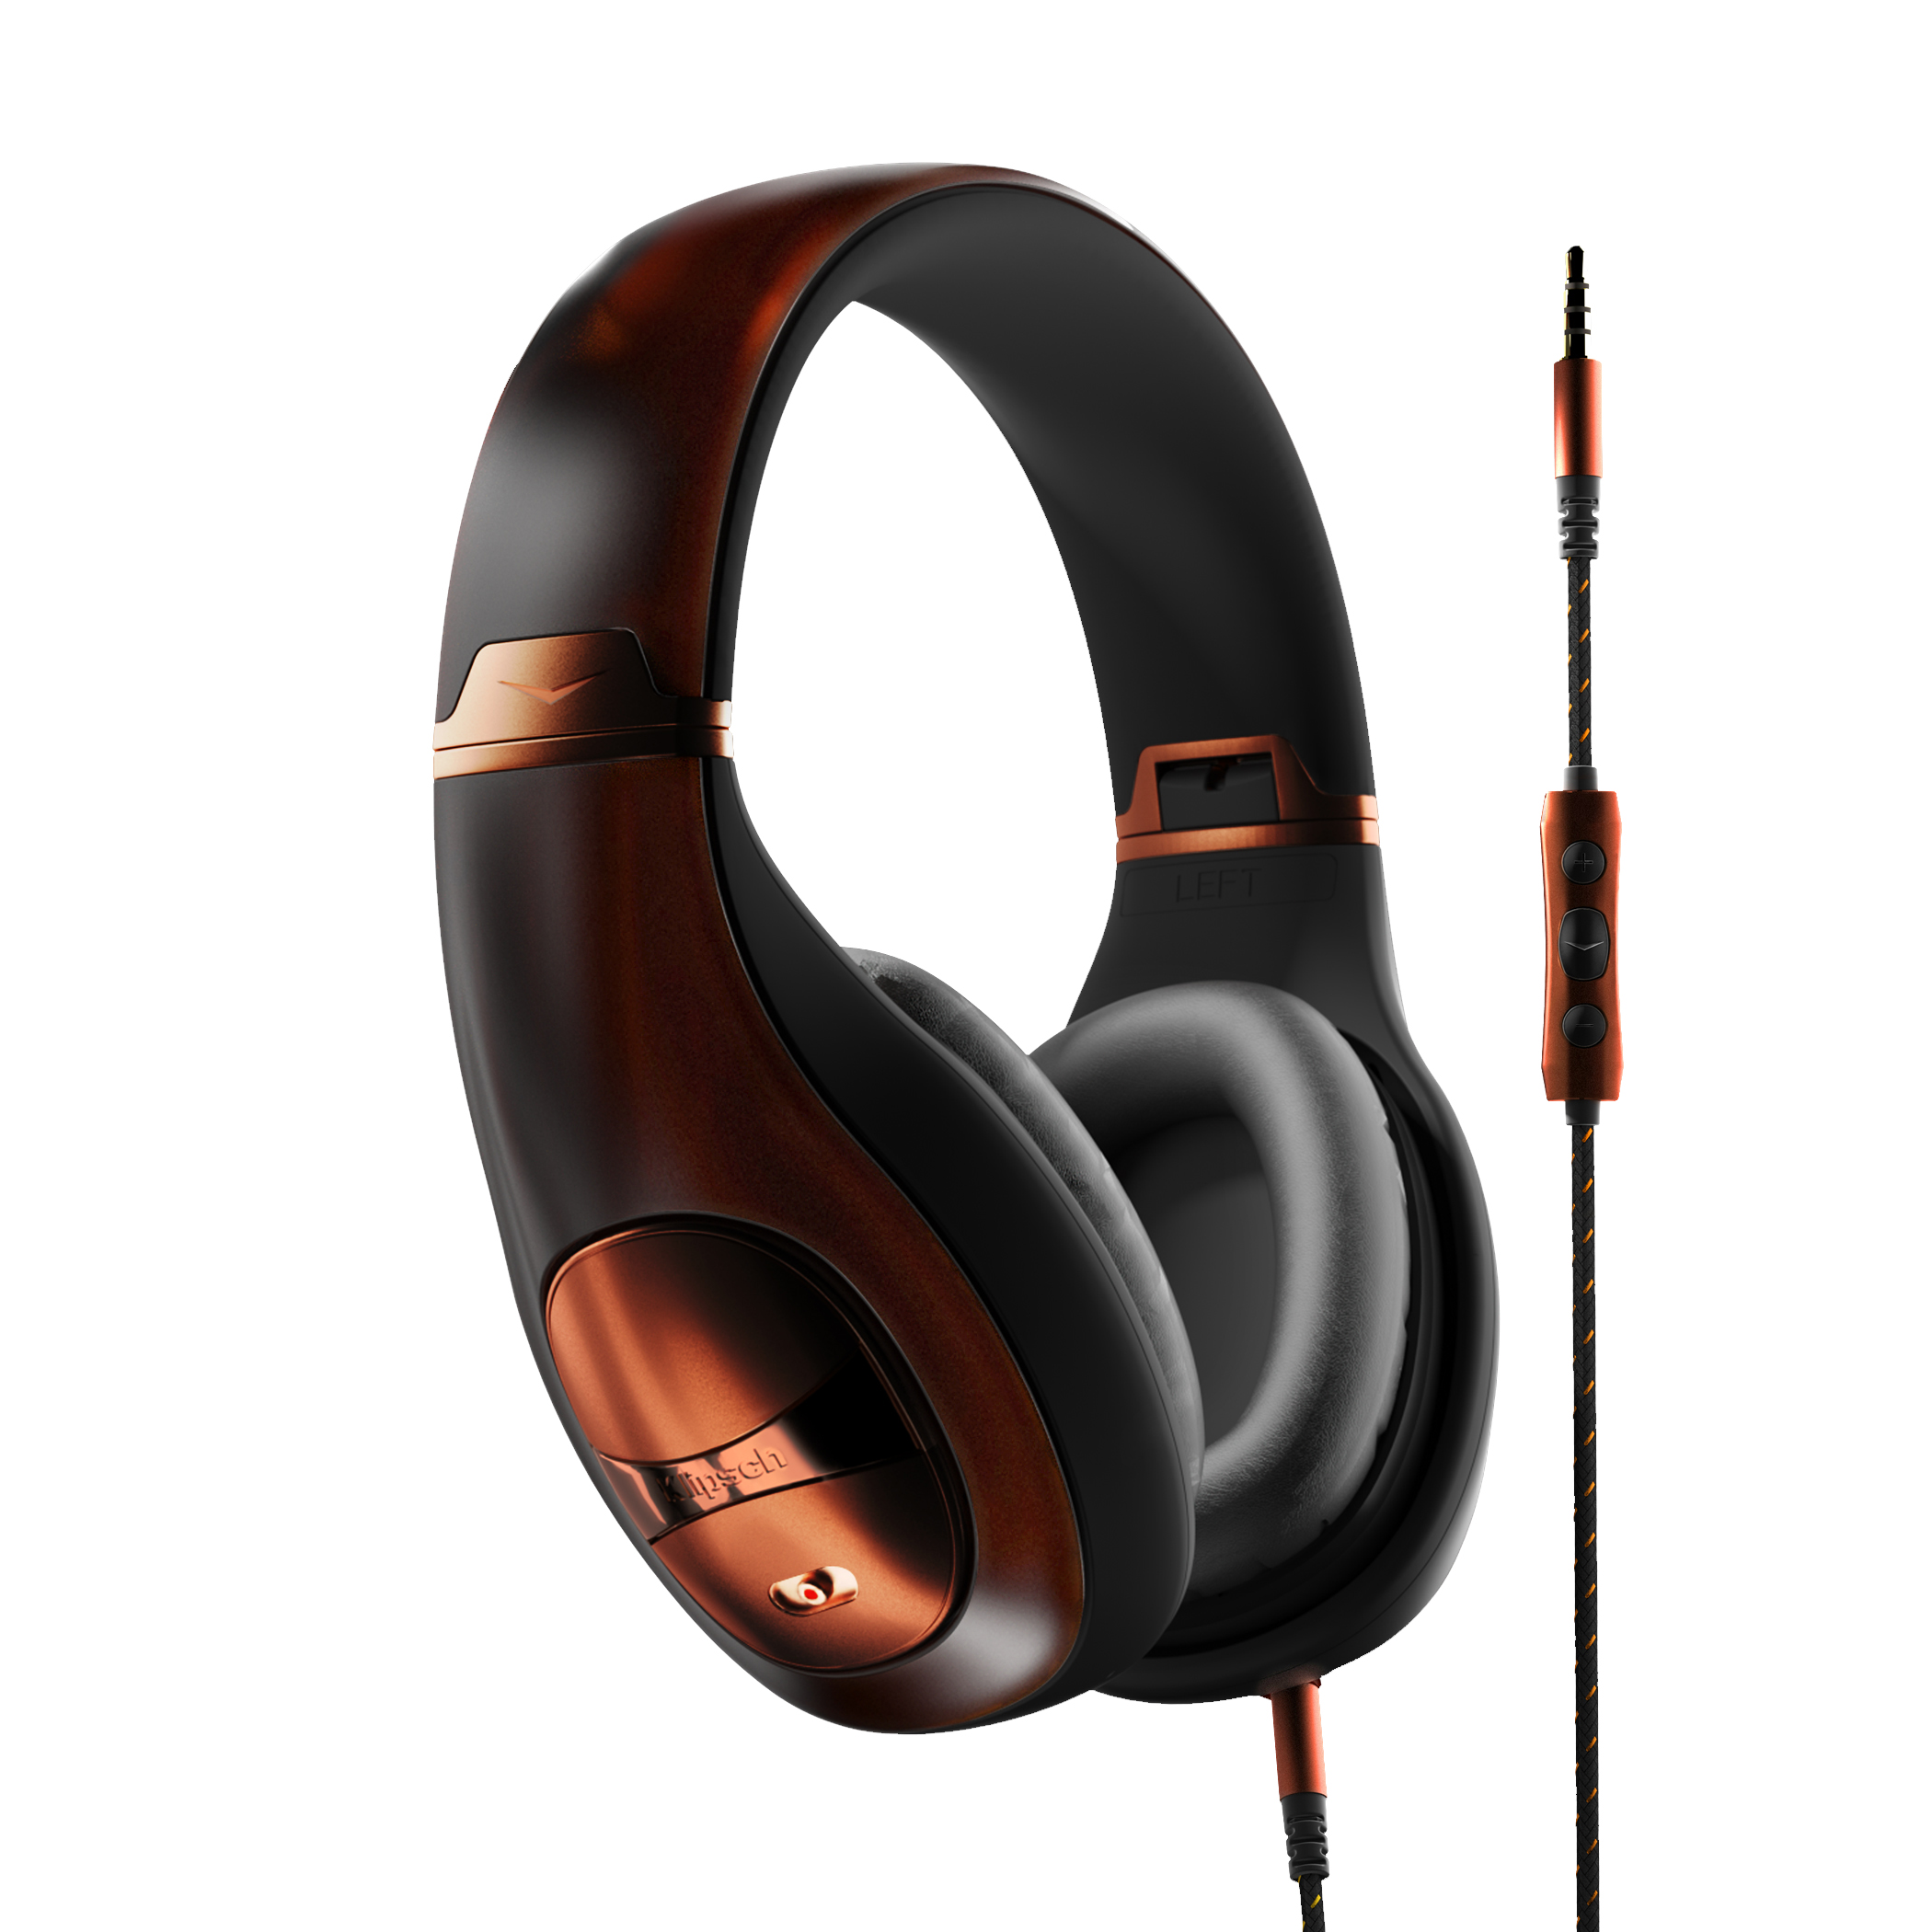 Klipsch Mode M40 Noise Canceling Headphones